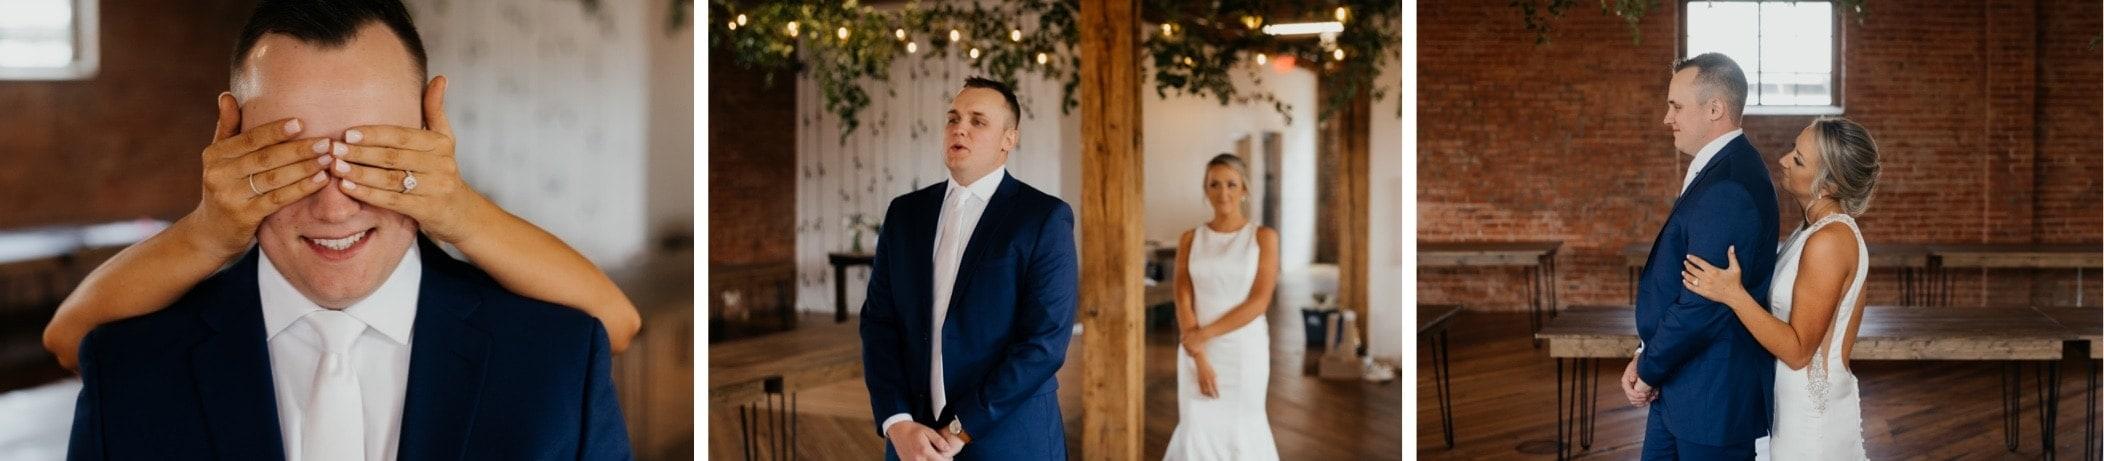 union kansas city wedding event space